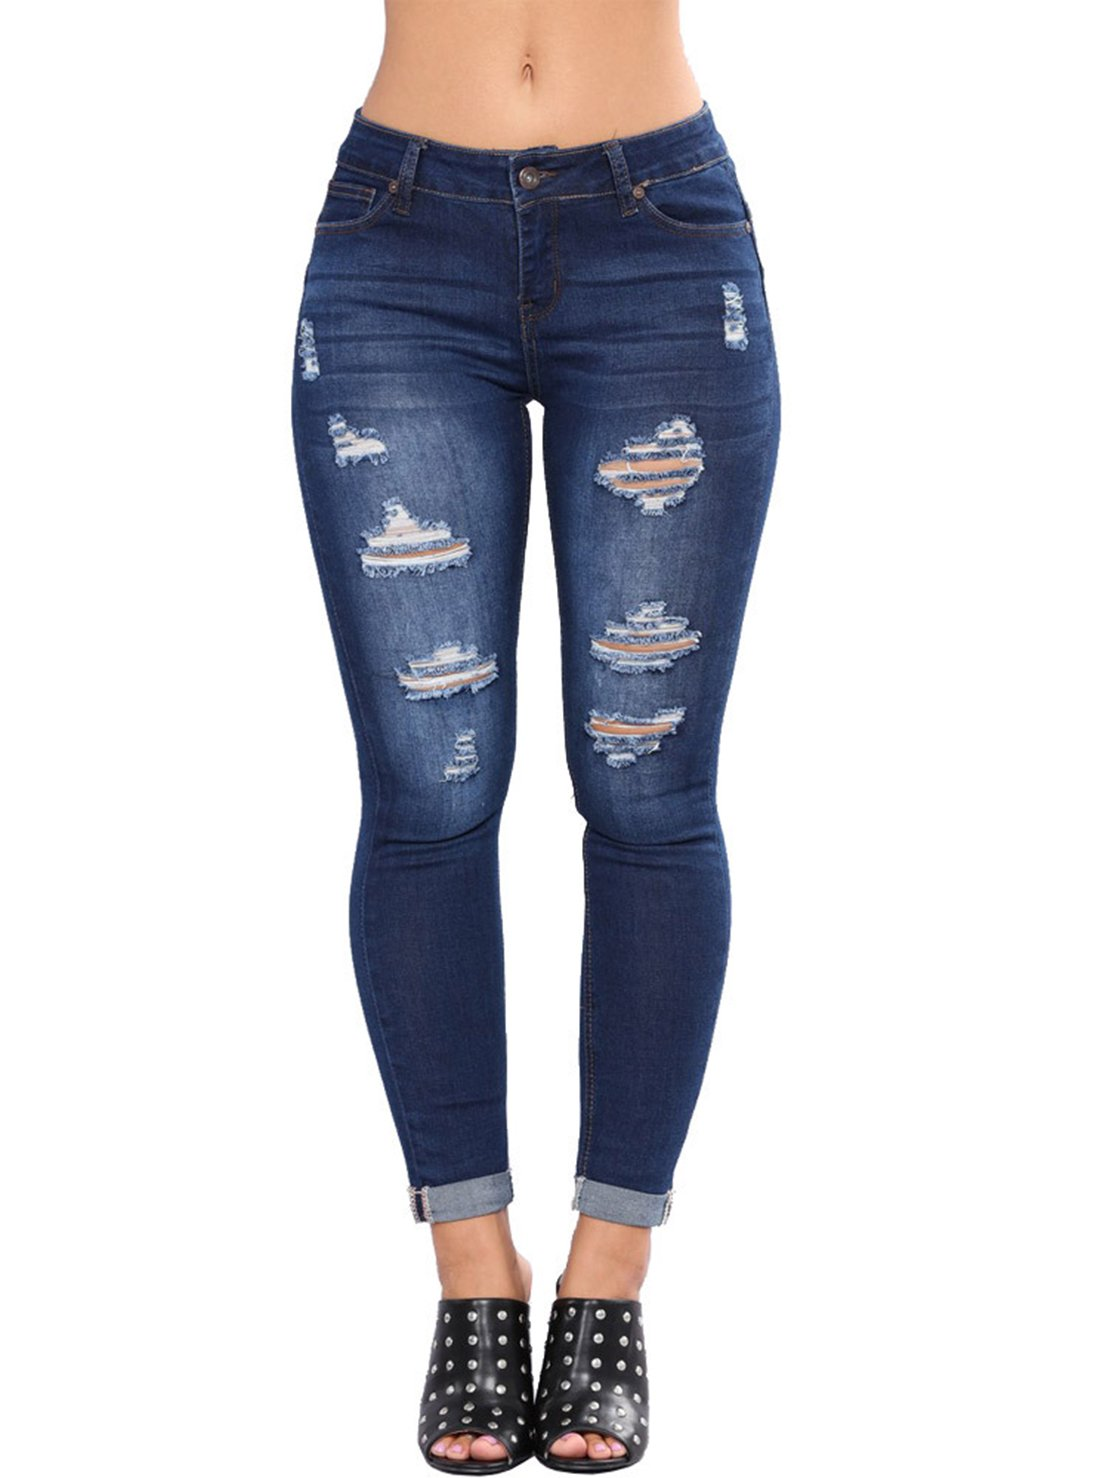 Full Length Ladies' Jeans